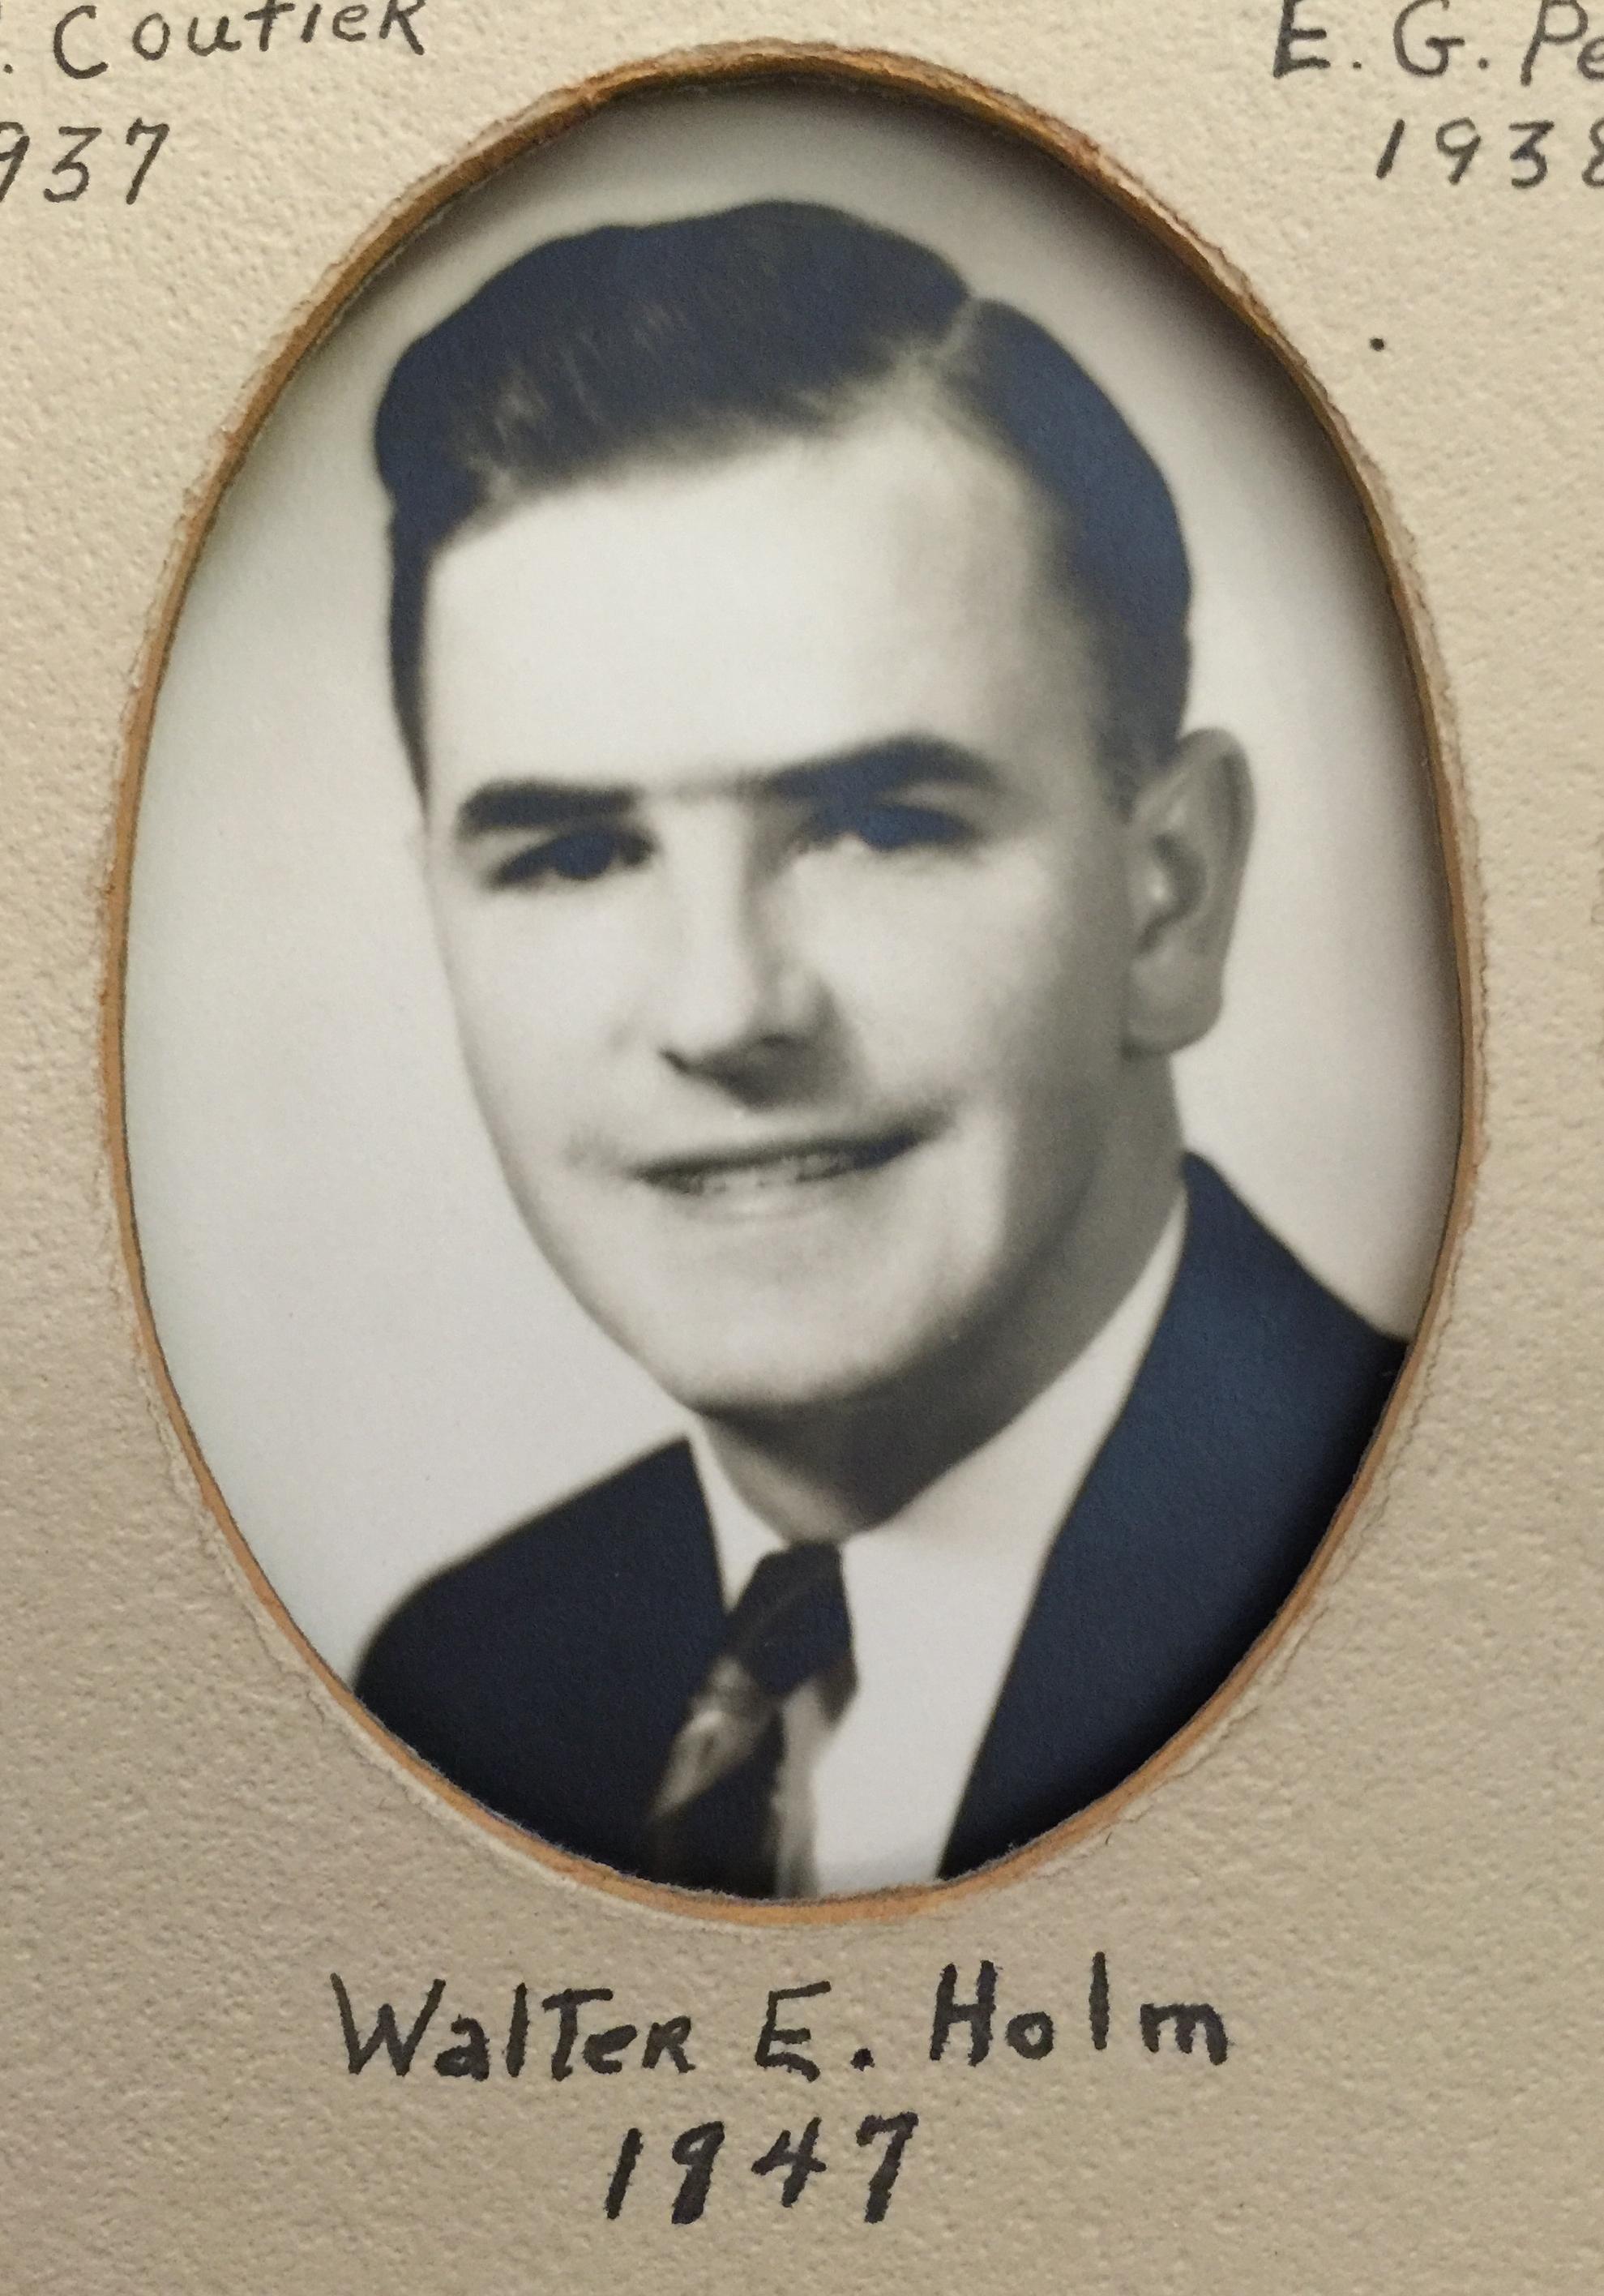 1947 Walter E. Holm